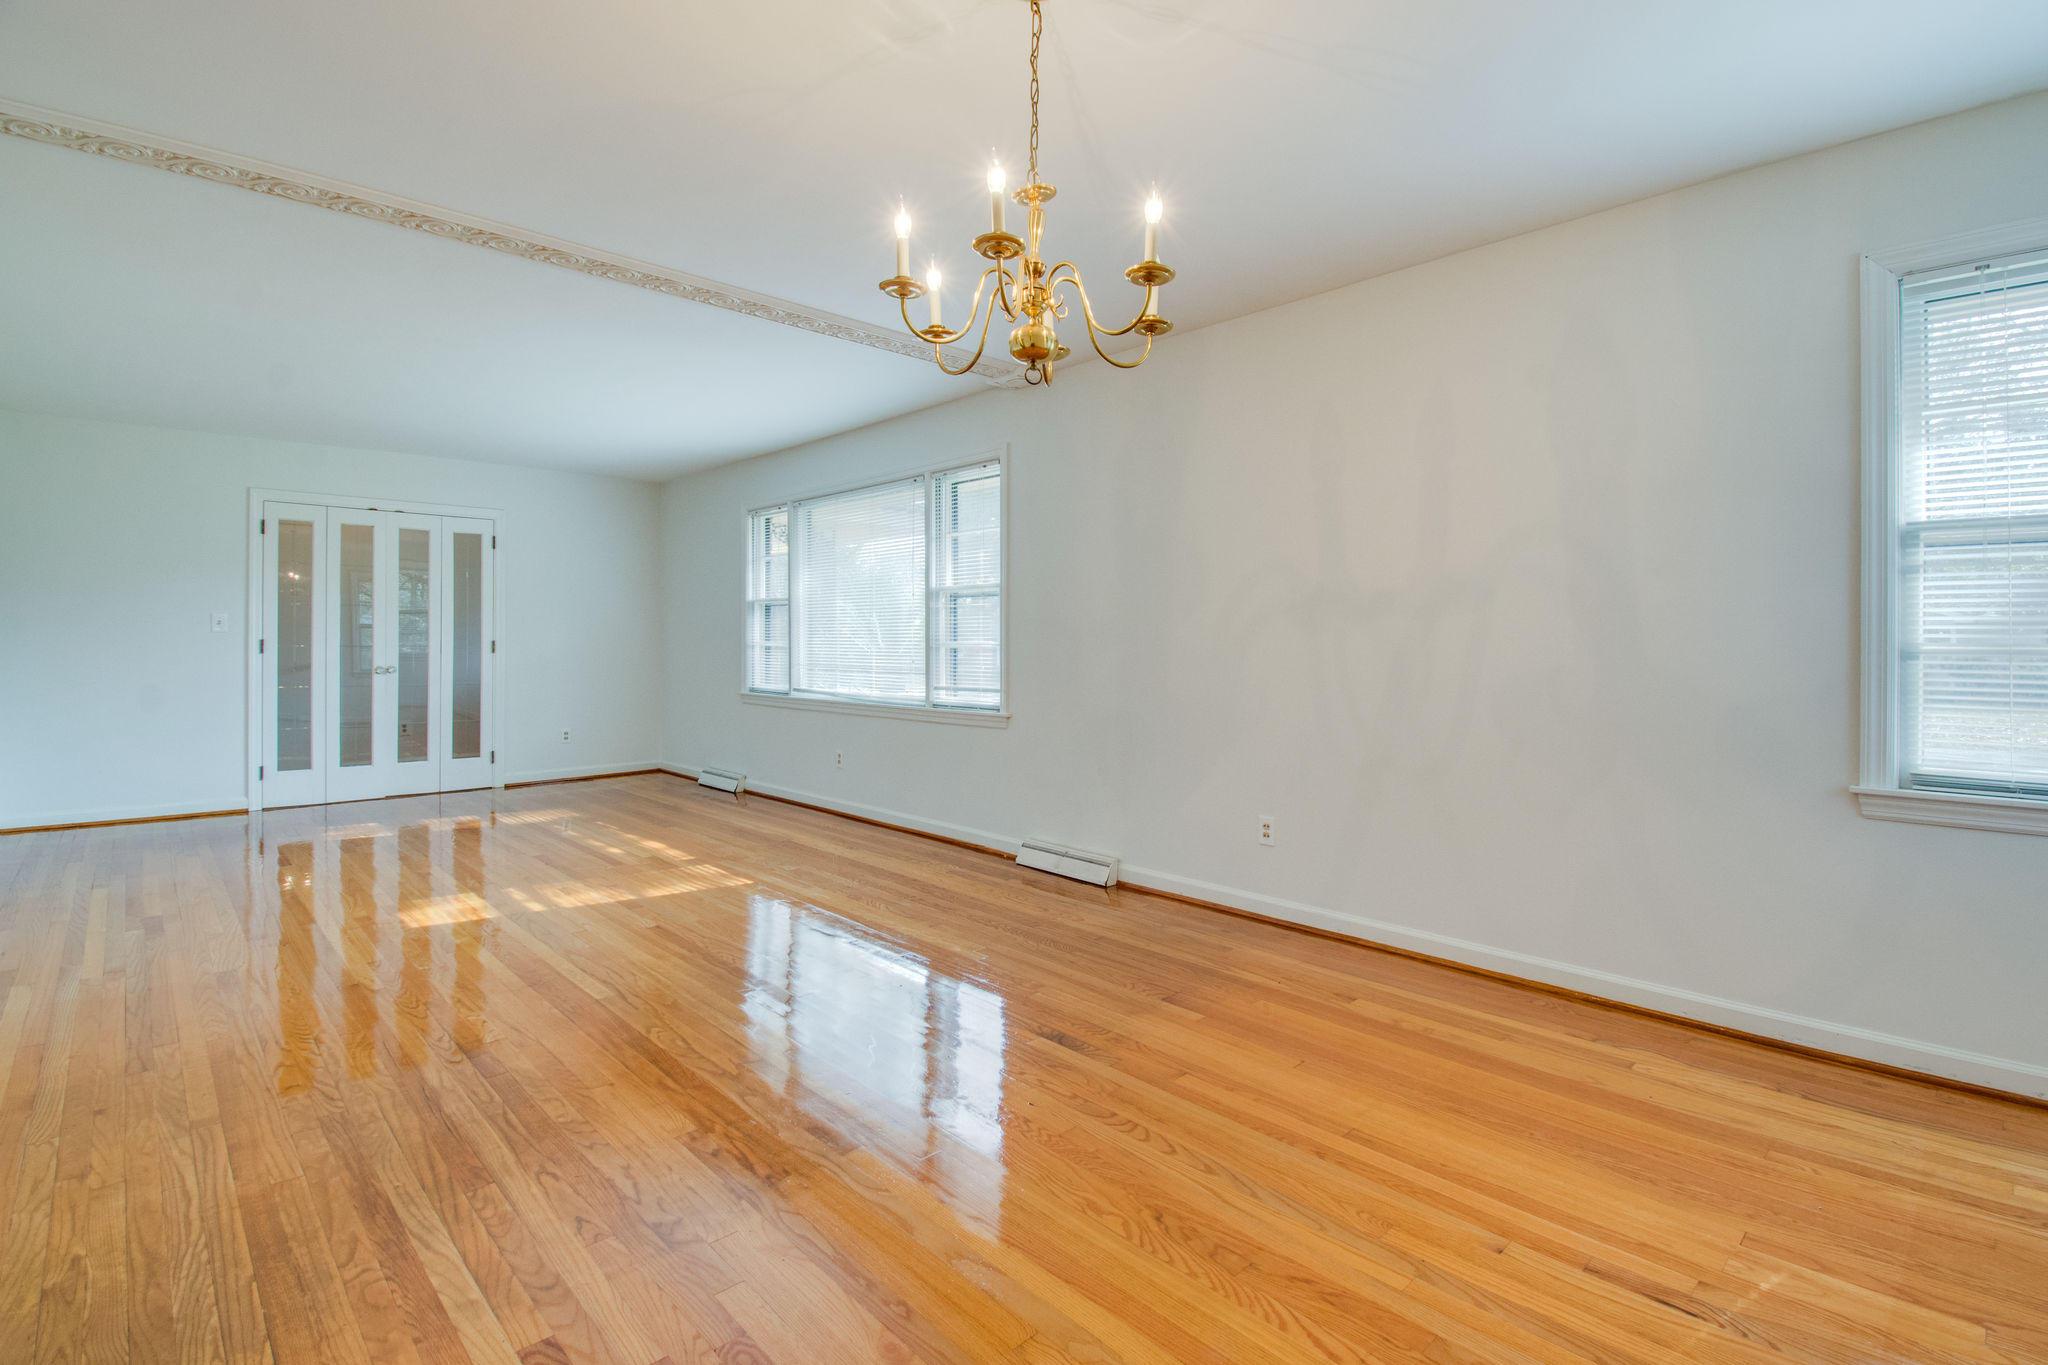 Northbridge Terrace Homes For Sale - 1114 Northbridge, Charleston, SC - 6